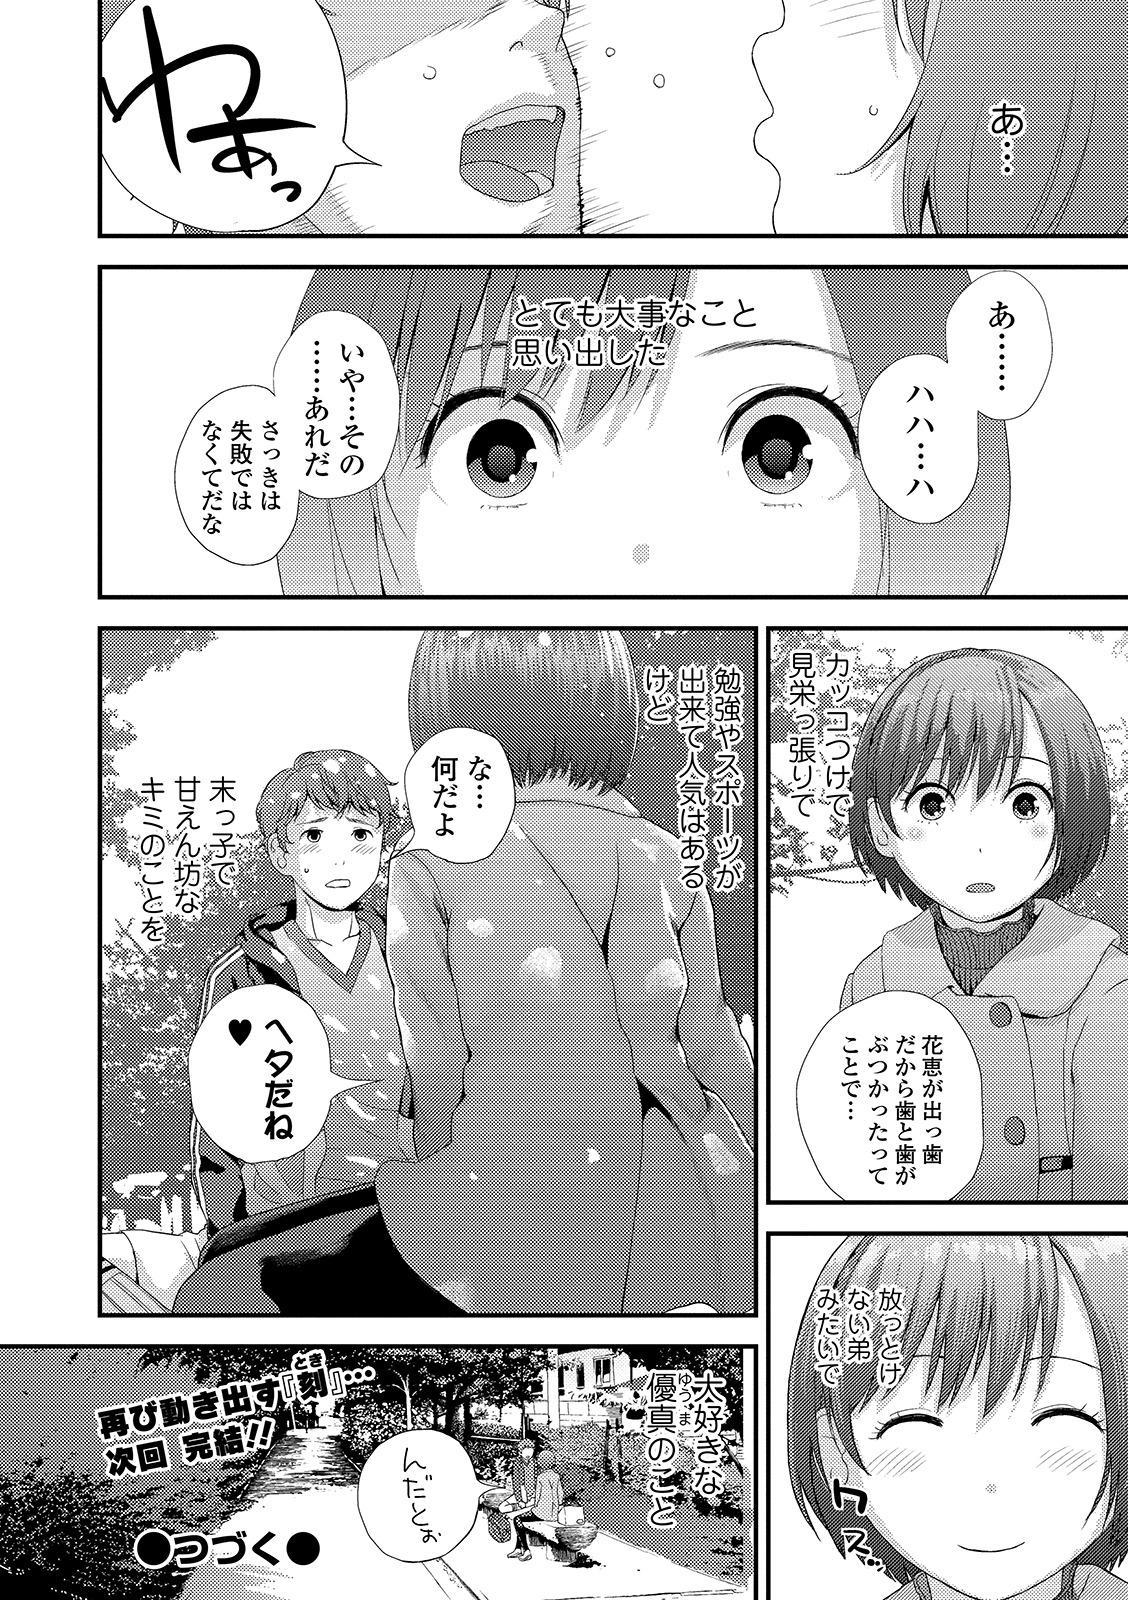 COMIC Shigekiteki SQUIRT!! Vol. 15 129